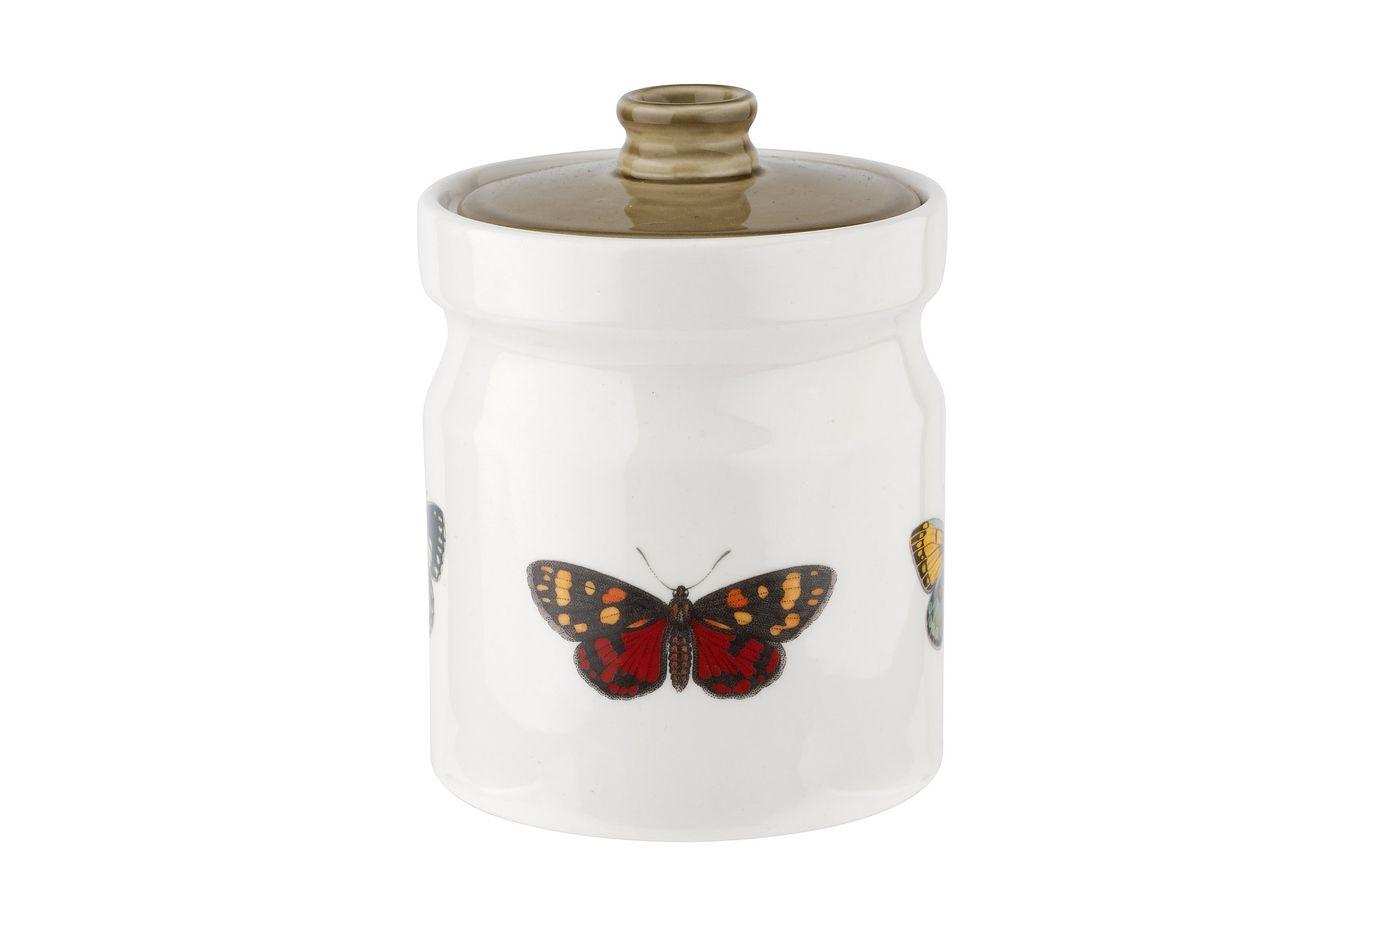 Portmeirion Botanic Garden Harmony Storage Jar + Lid 14cm thumb 1